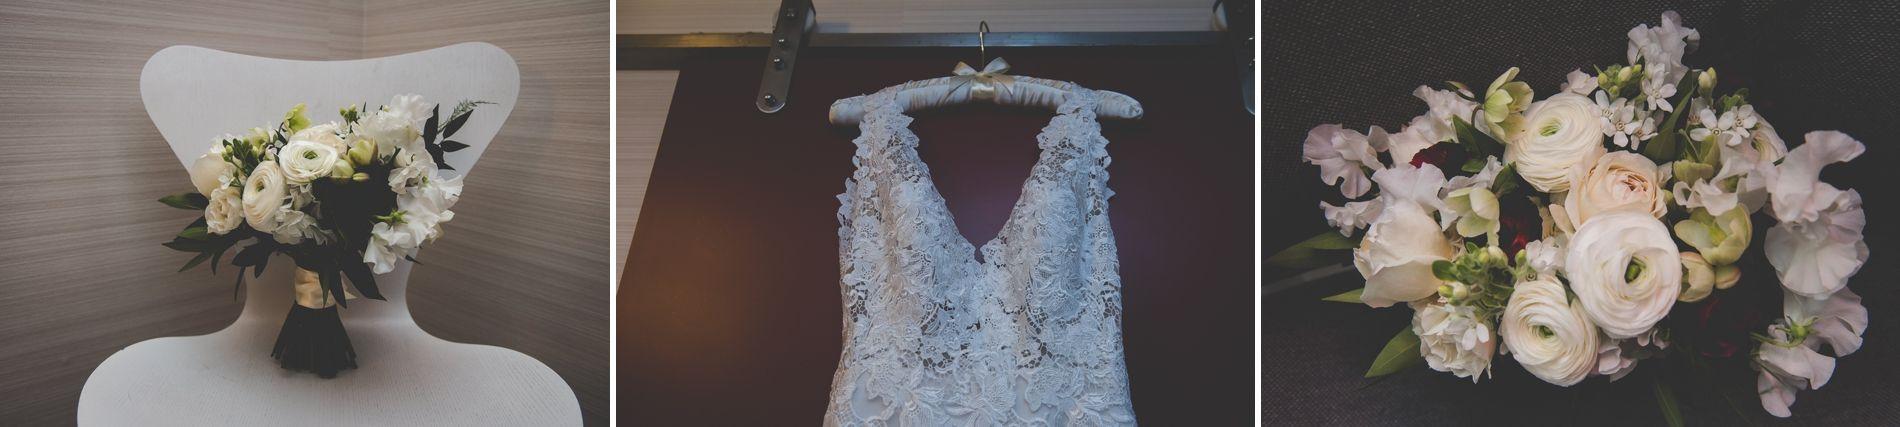 Wedding dress from Bella Moda,  Conshohocken PA, flowers by Falls Flowers || JG Domestic Wedding || Laura and Nate Get Married in Philadelphia || BG Productions || www.bgproonline.com